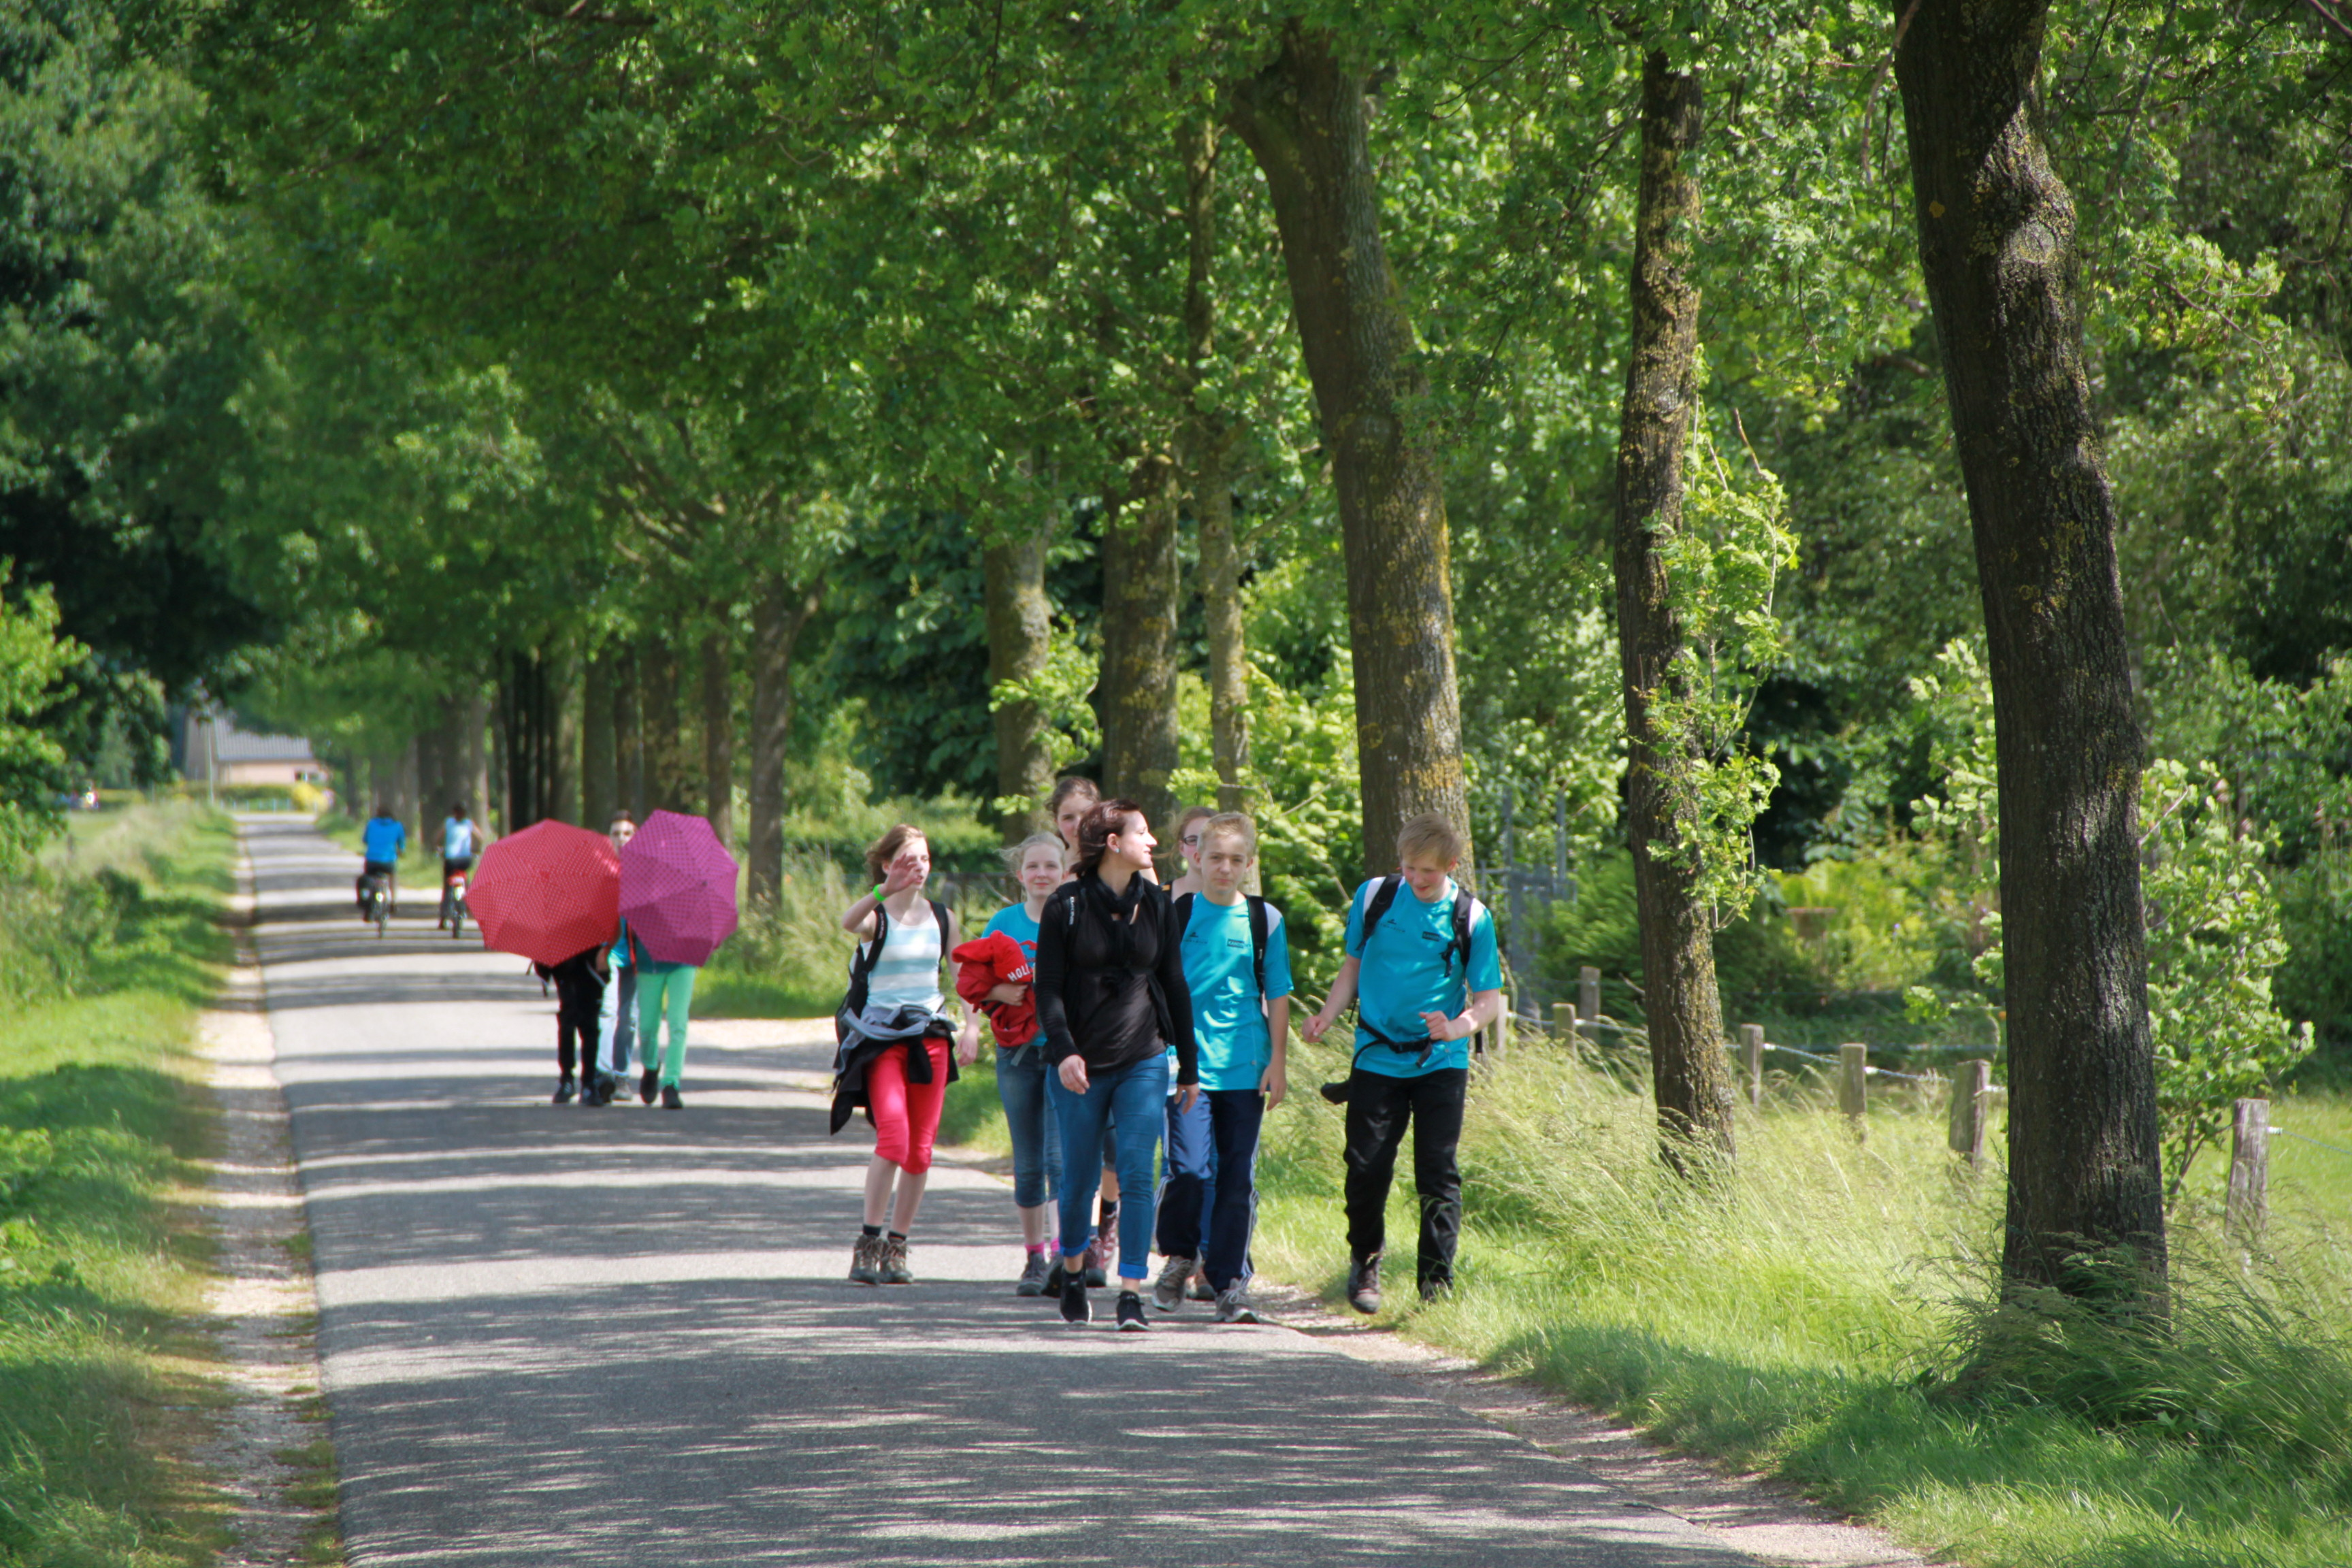 30 km an einem Tag geschafft! – Vierdaagse-Gruppe trainiert fleißig